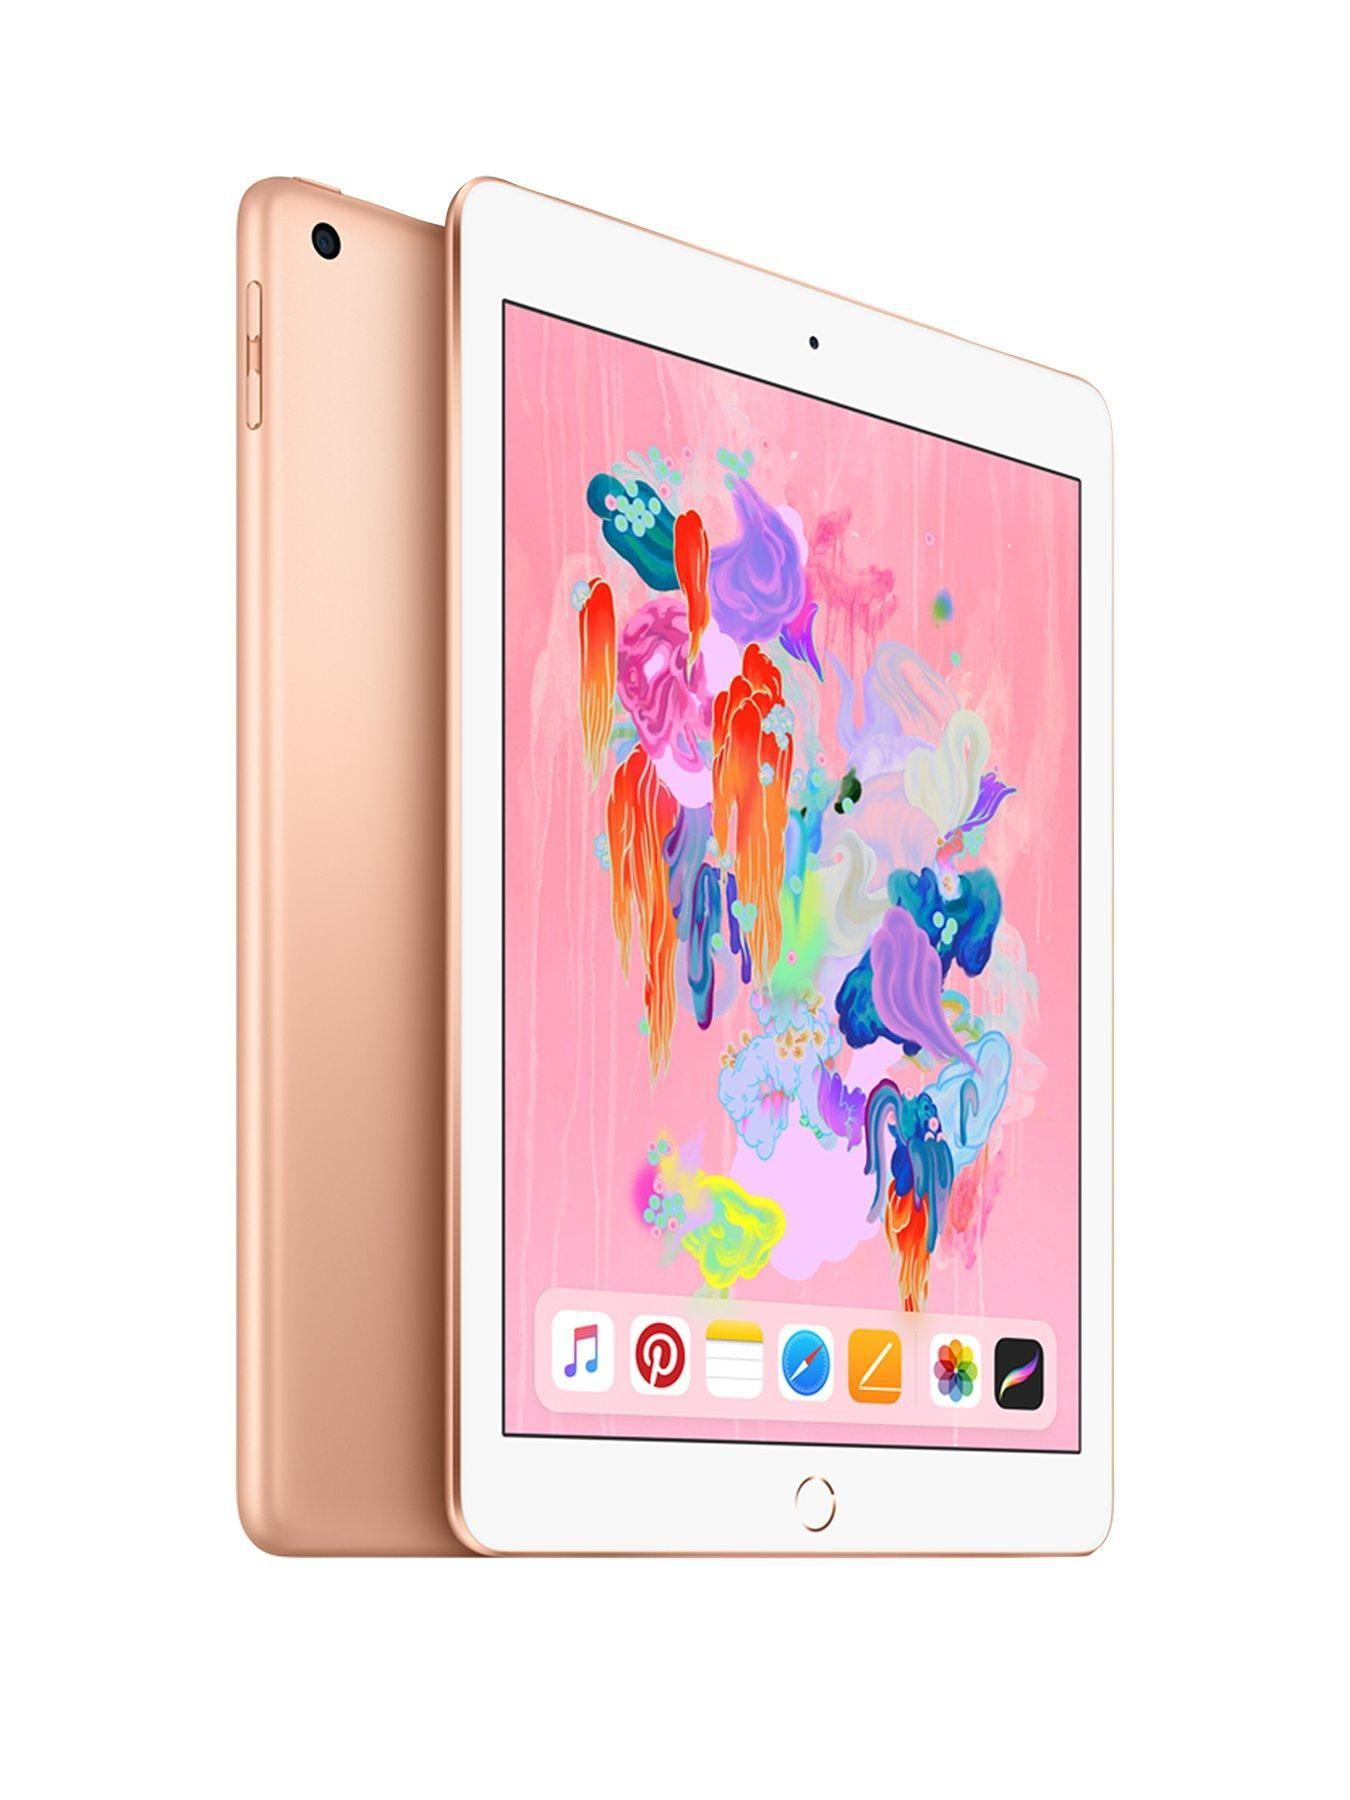 Ipad 2018 128gb Wi Fi 9 7in With Optional Apple Pencil Gold Apple Ipad Ipad 32gb Ipad